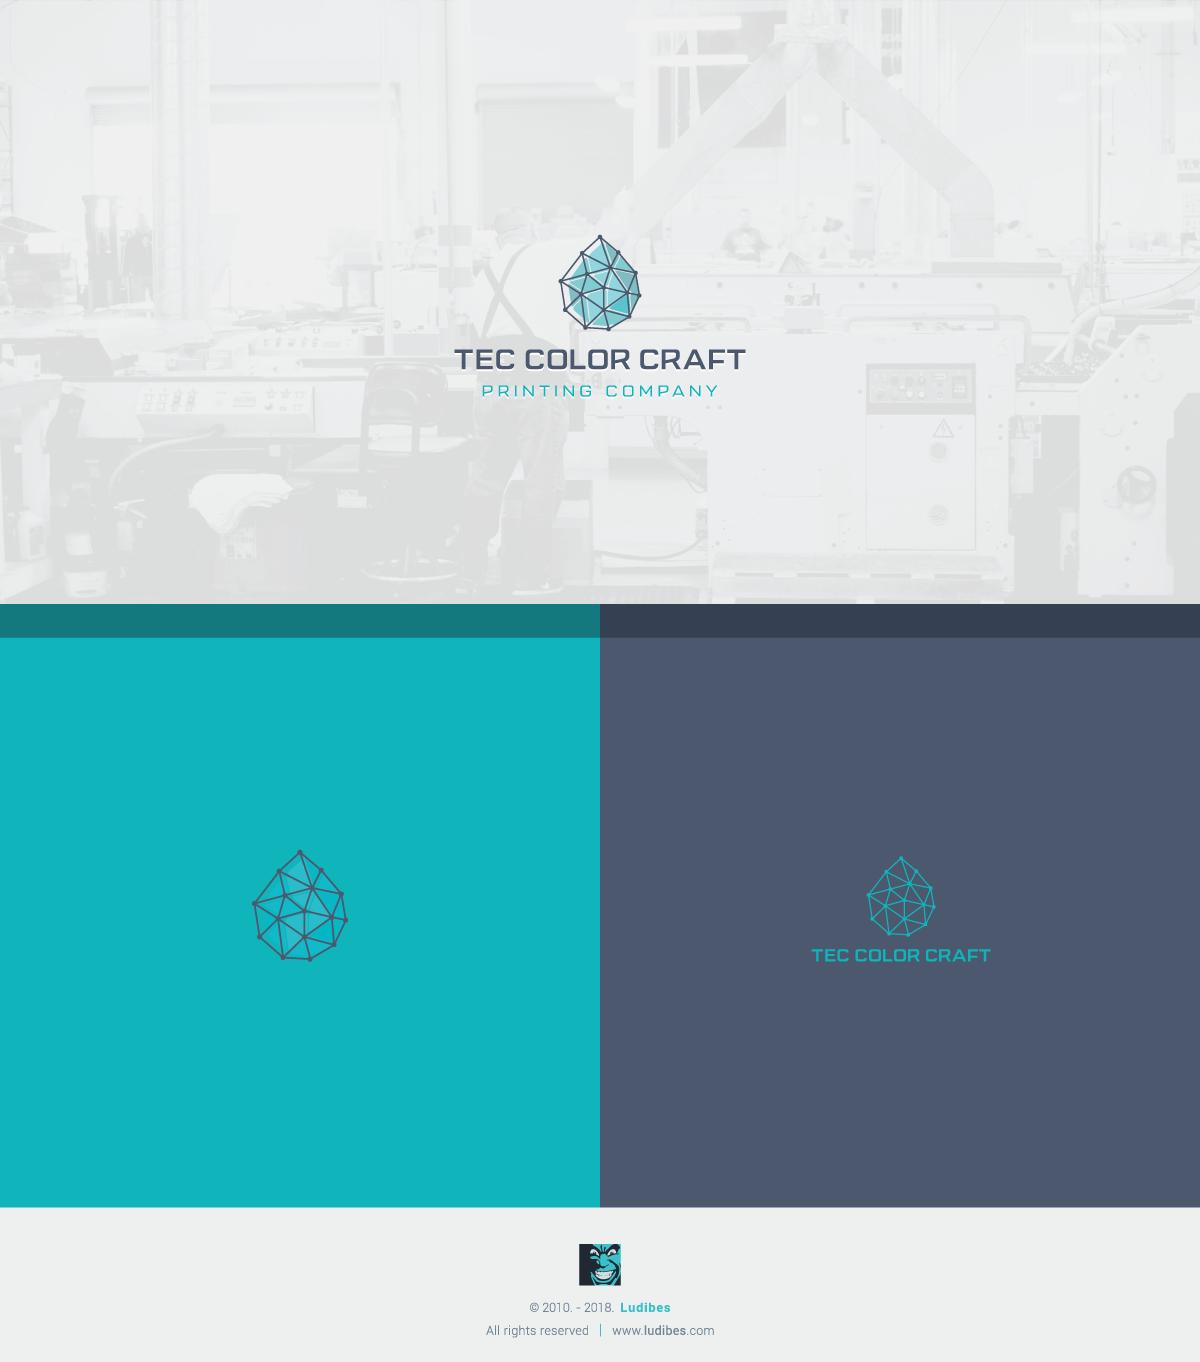 Tec Color Craft 2018 Branding